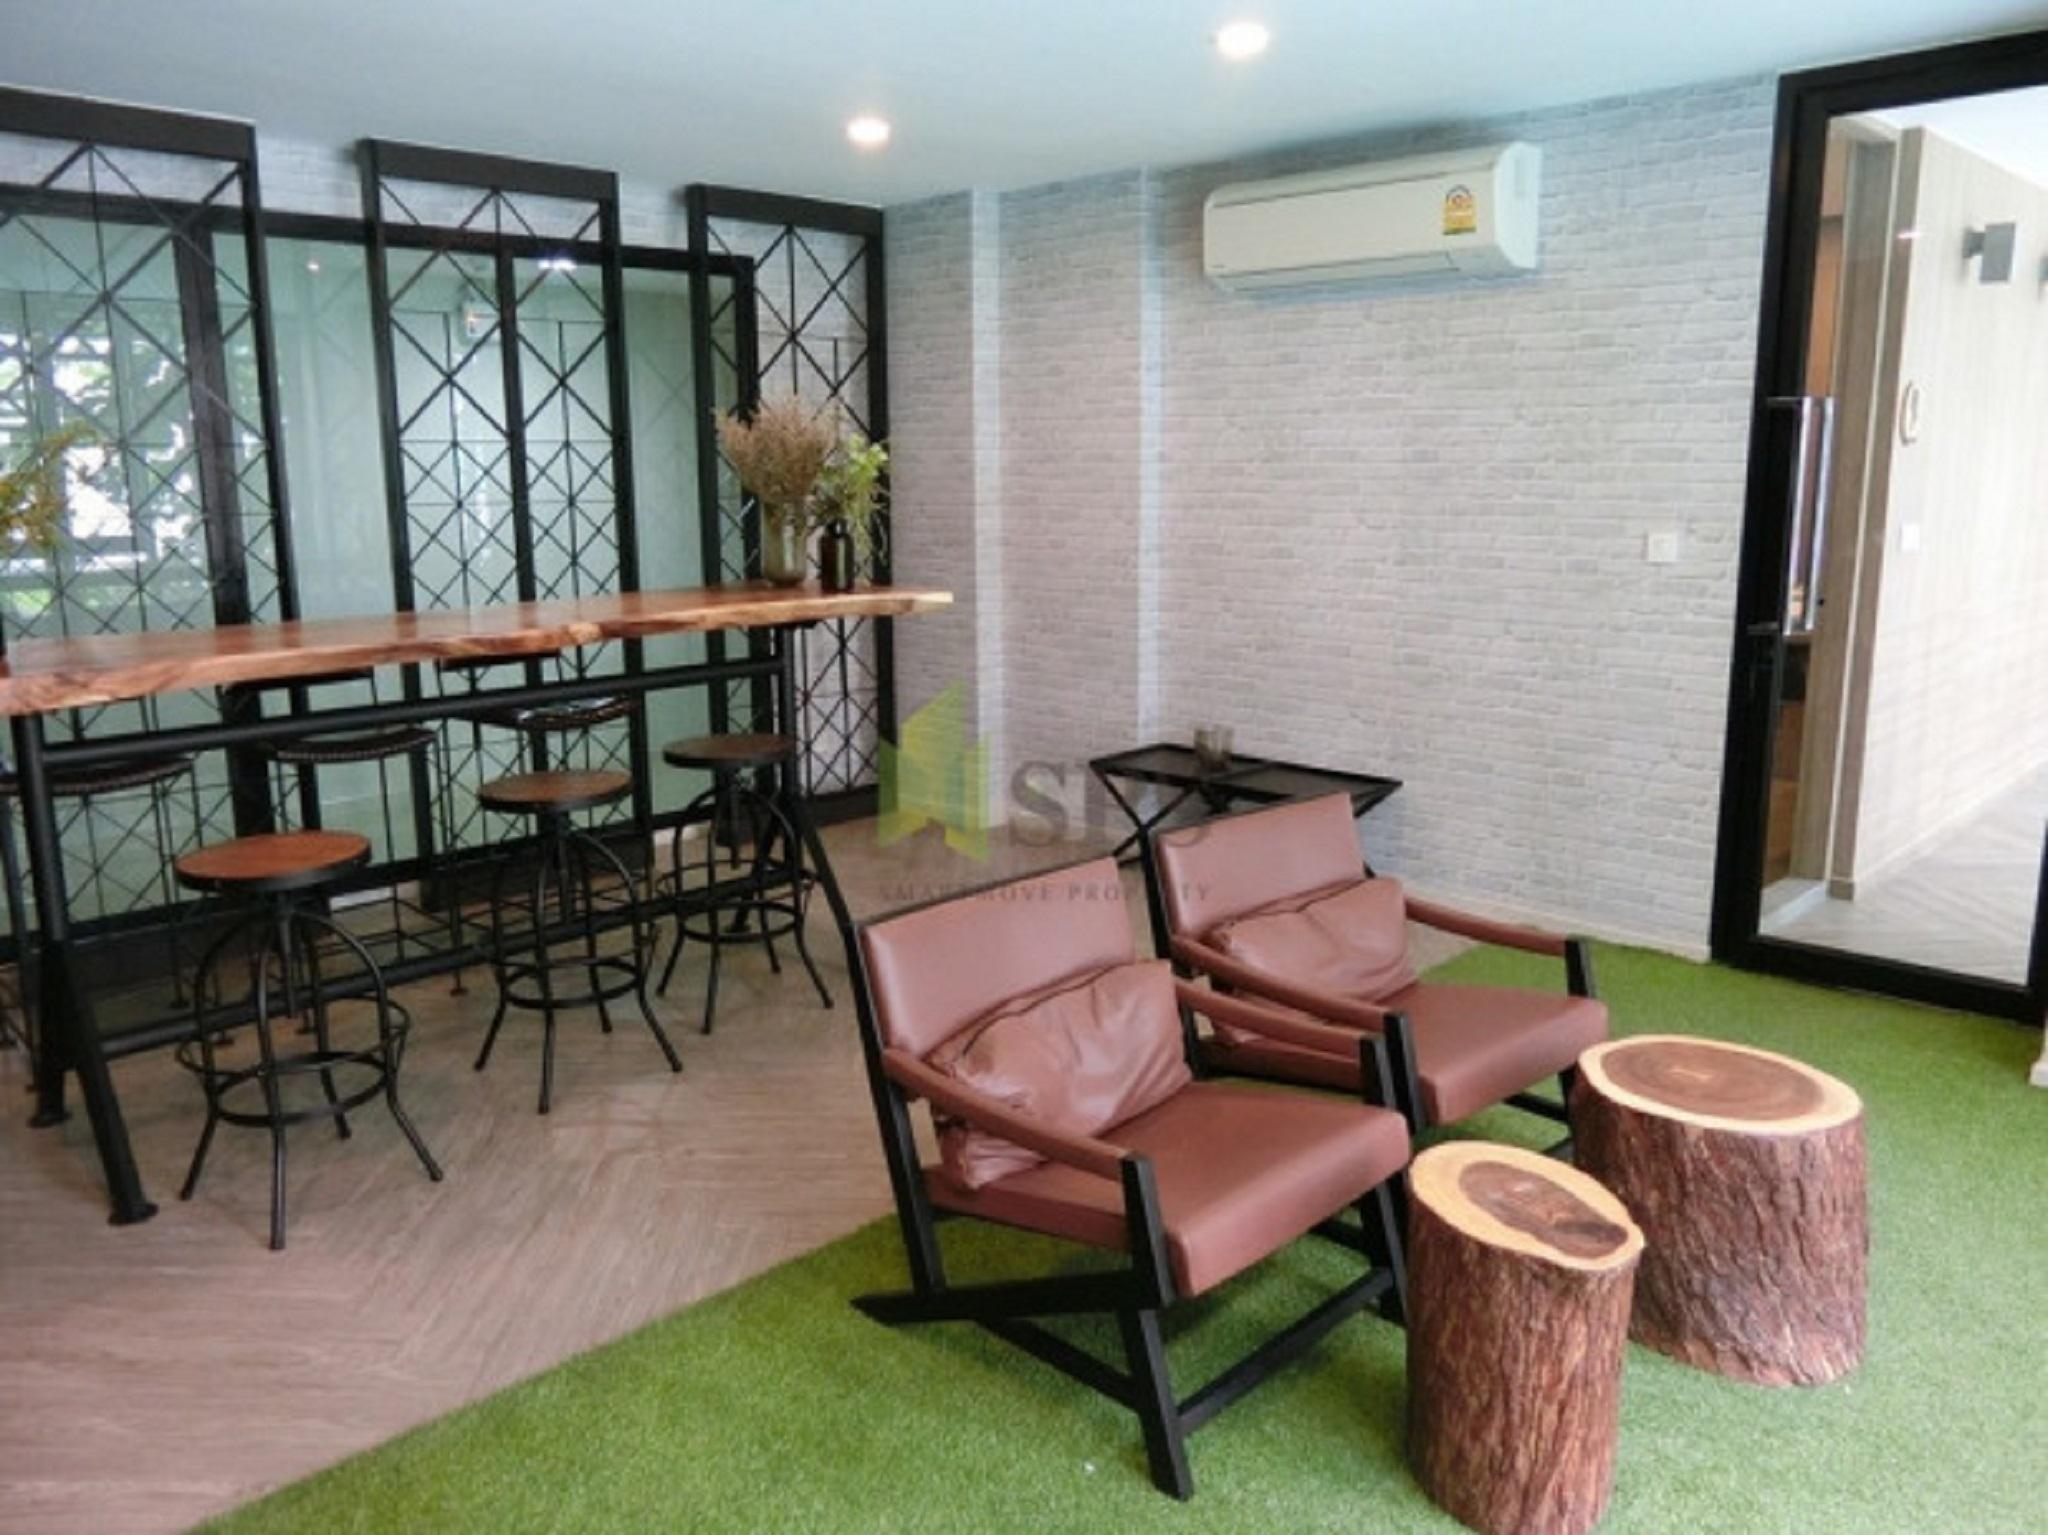 Villa Lasalle Condo B Near BTS @ Sukhumvit Road,Villa Lasalle Condo B Near BTS @ Sukhumvit Road